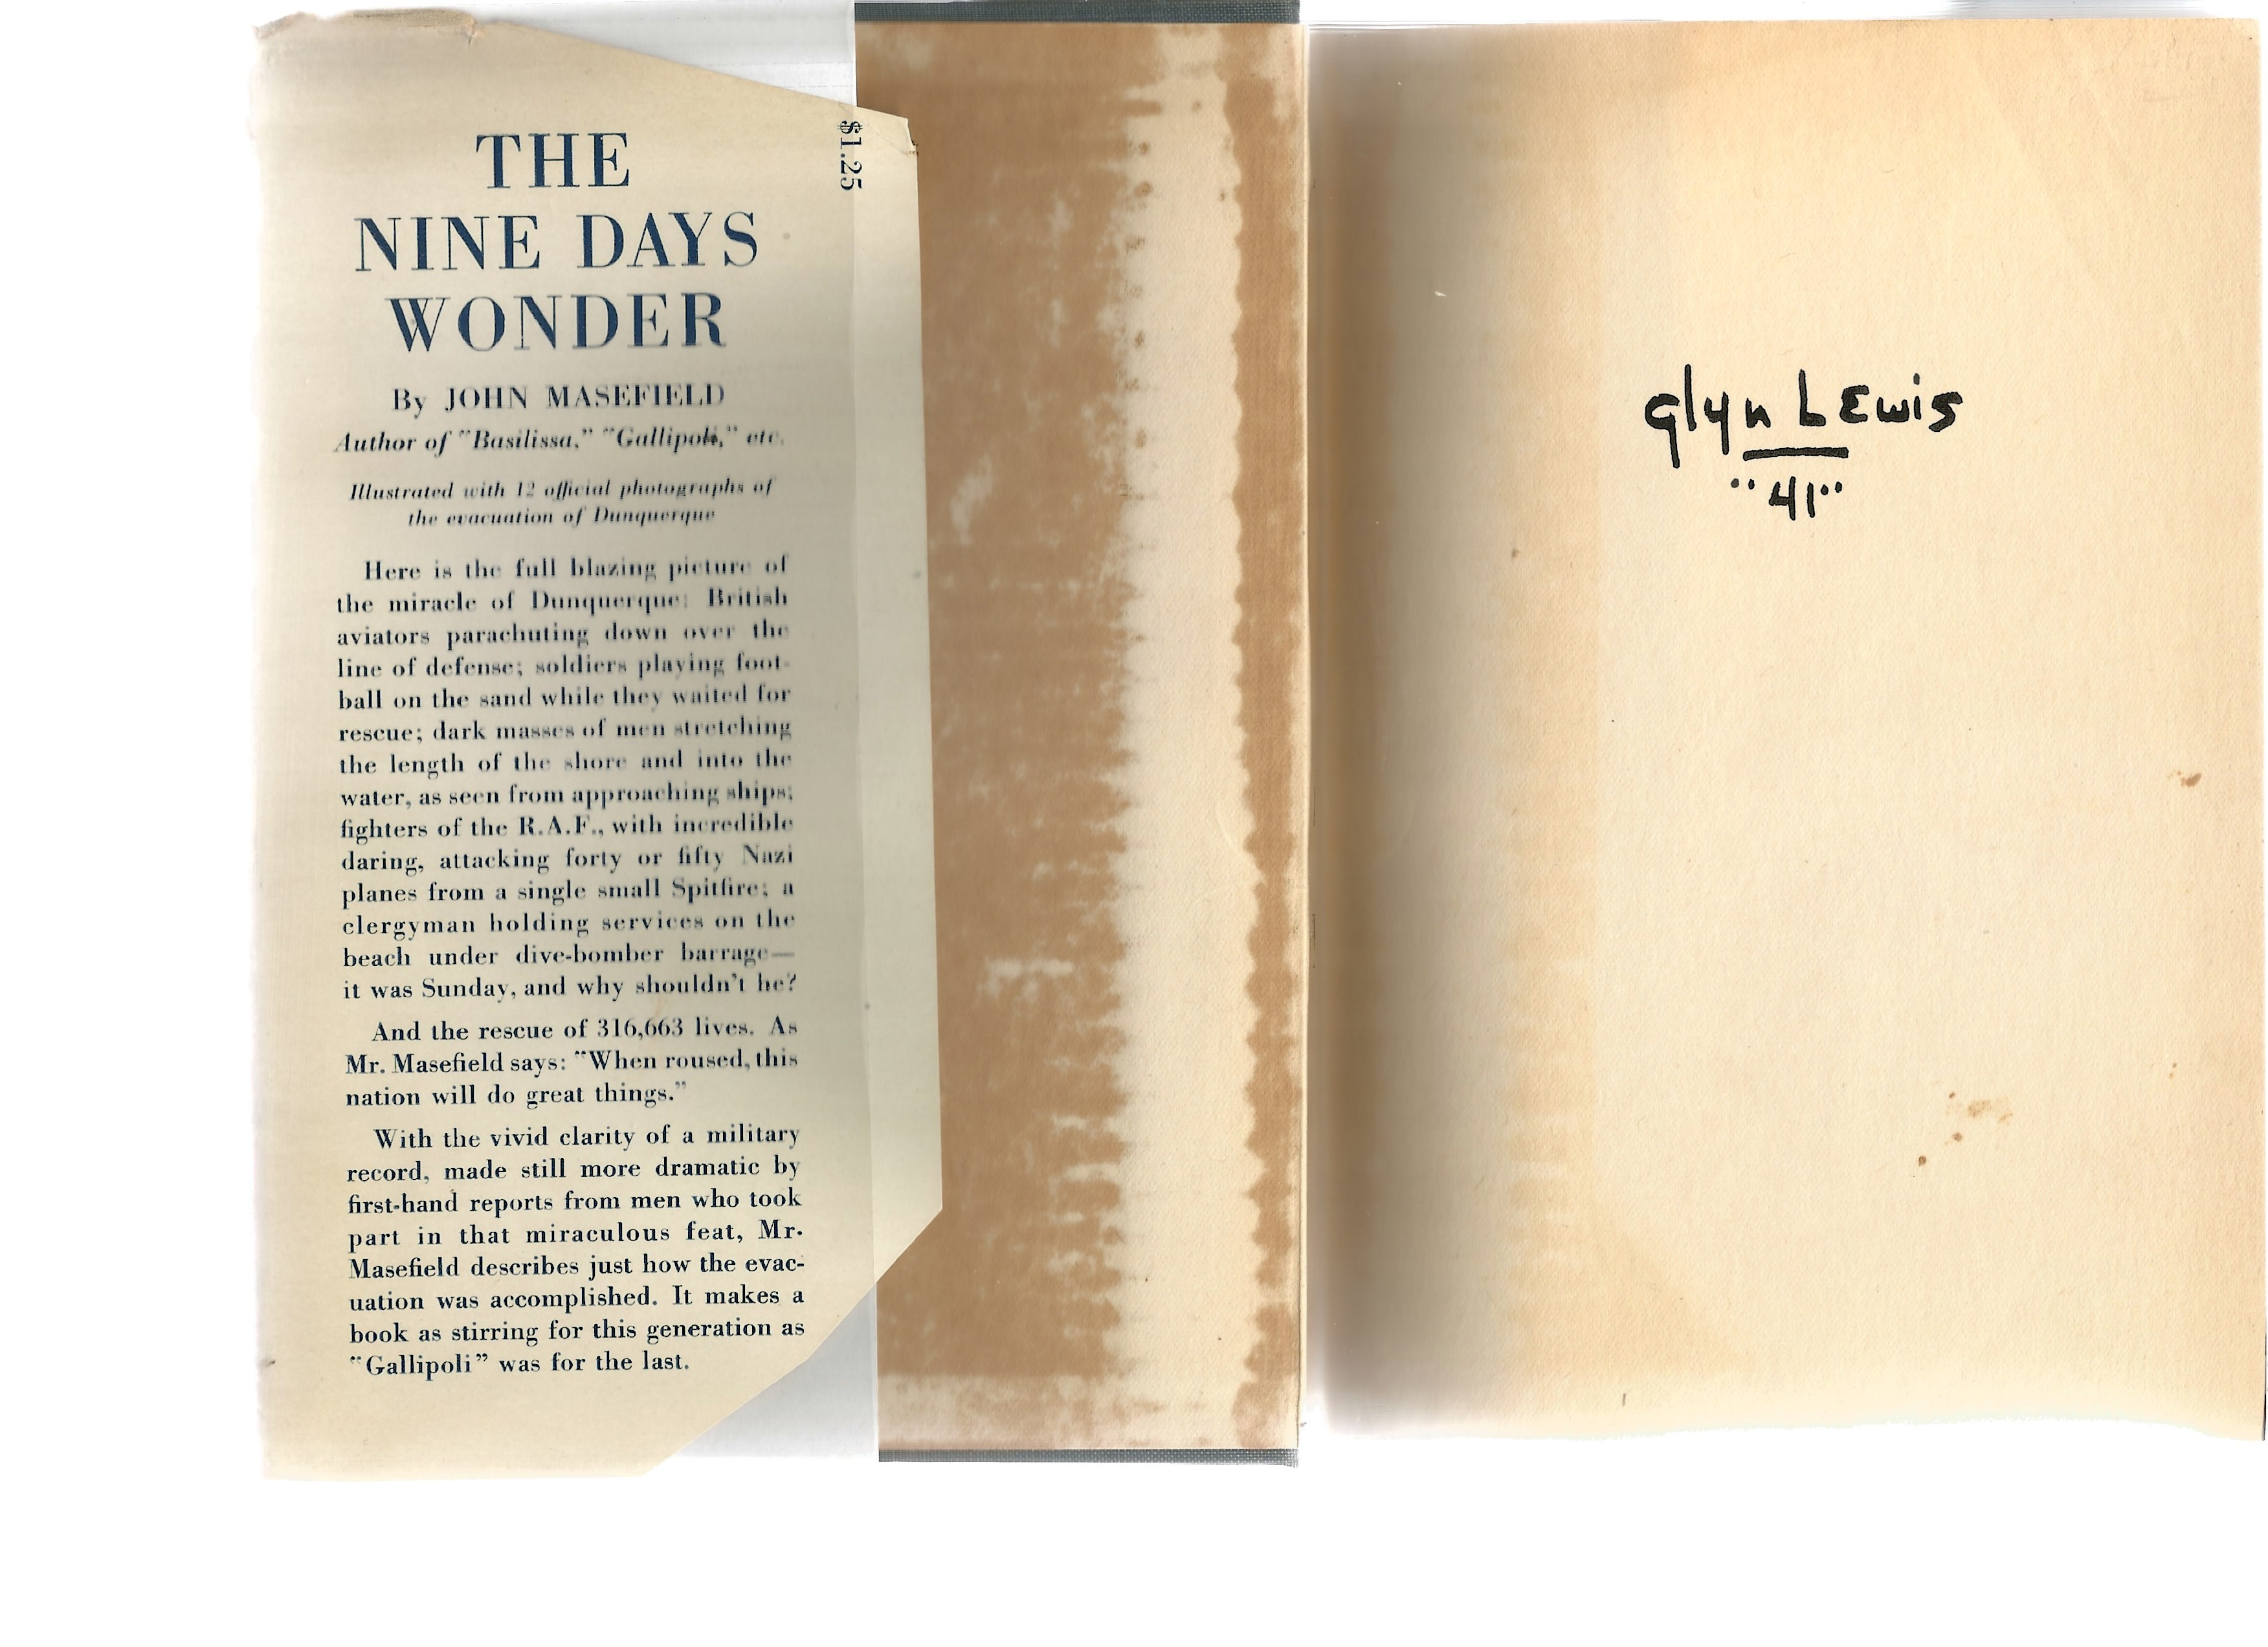 John Masefield. The Nine Days Wonder. May 26th, 1940, June 3rd, 1940. a ww2 hardback first edition